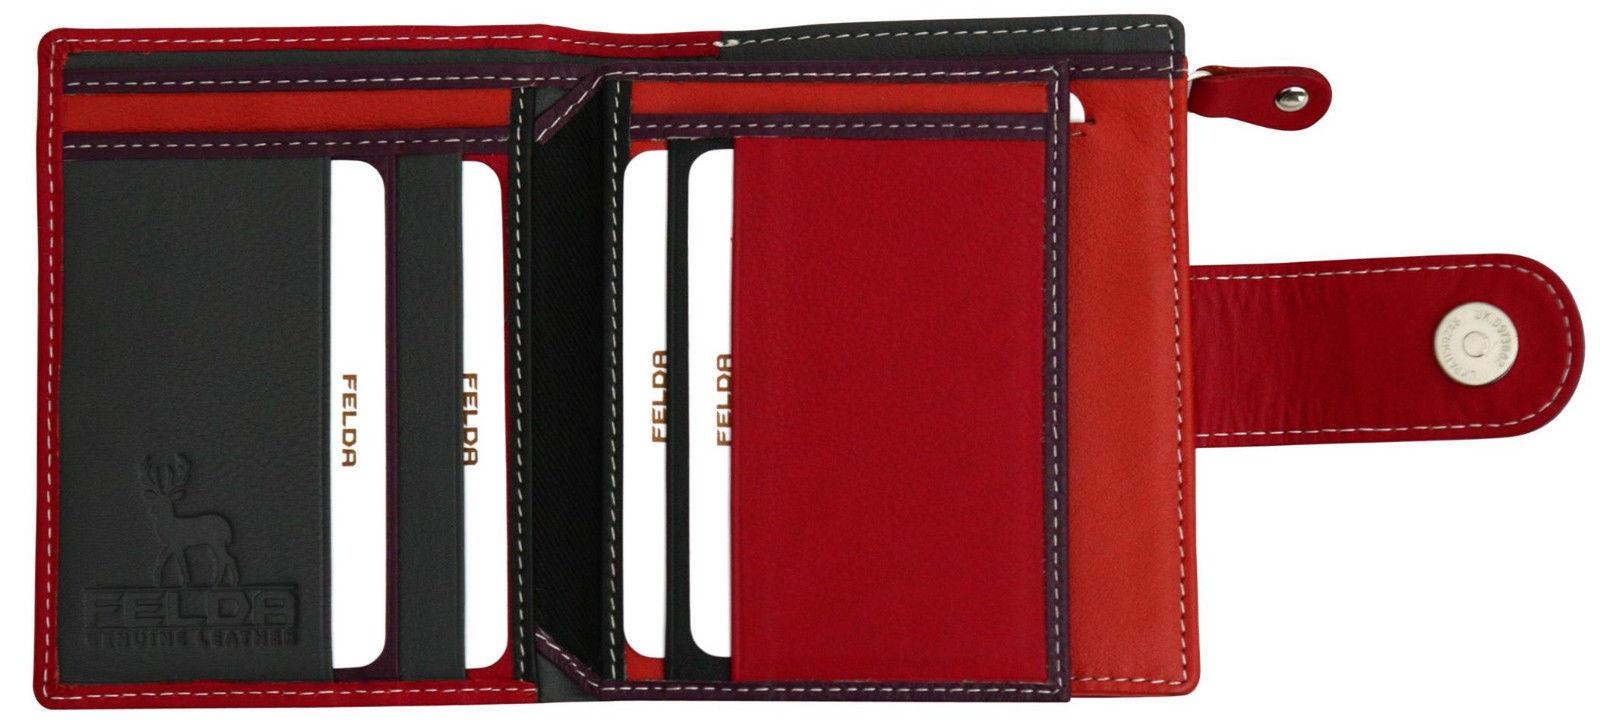 Felda-RFID-onorevoli-MEDAGLIA-amp-Card-Purse-Wallet-Genuine-Leather-Multi-SOFT-BOX-REGALO miniatura 106